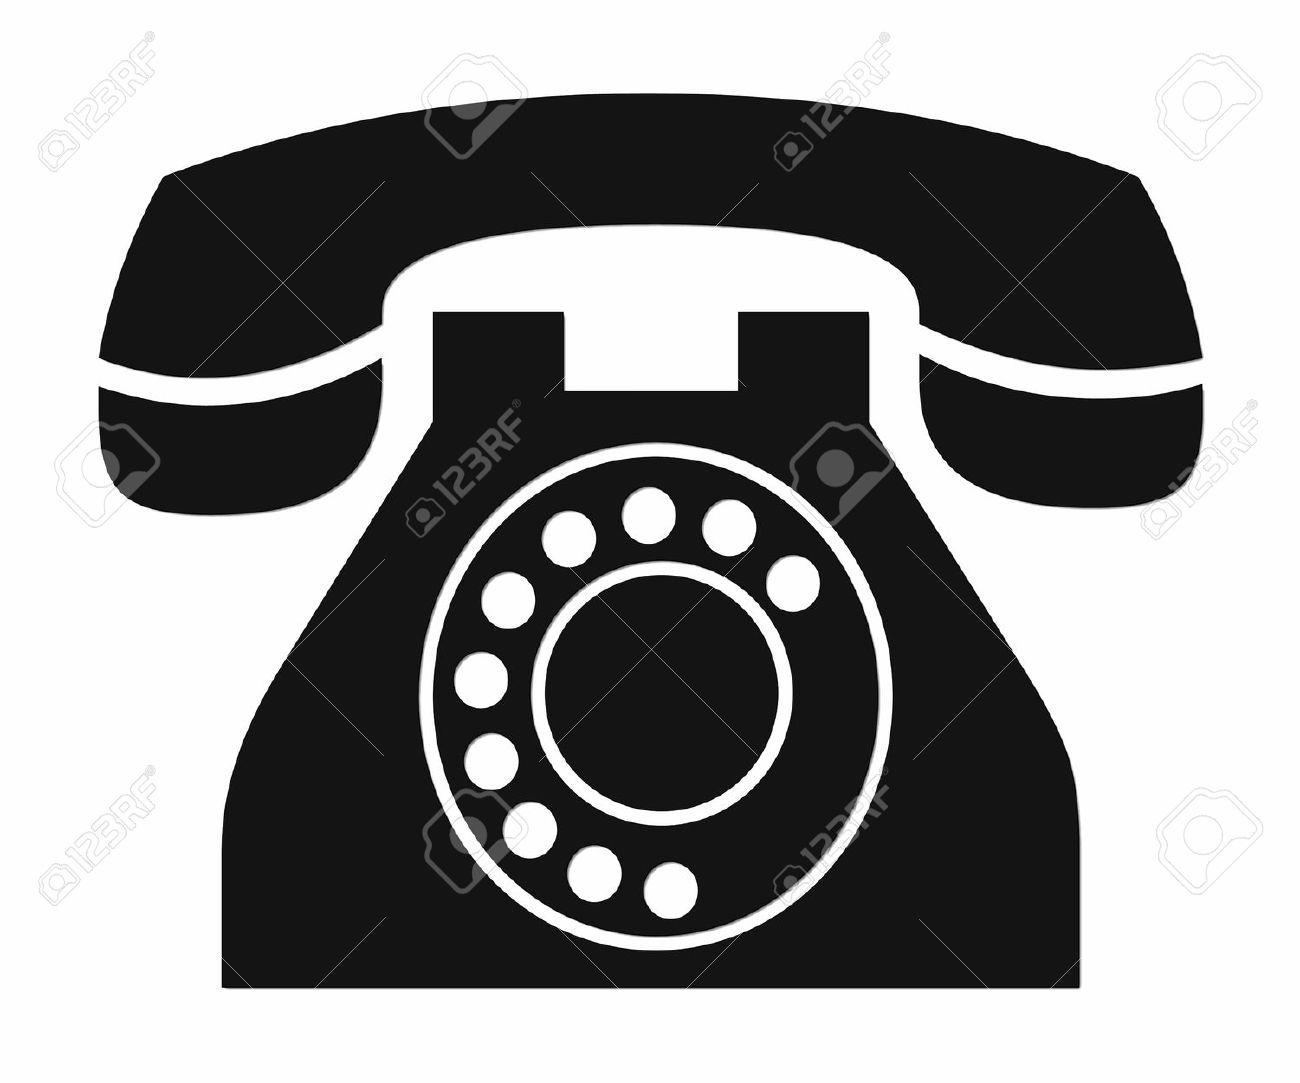 phone clipart-phone clipart-10